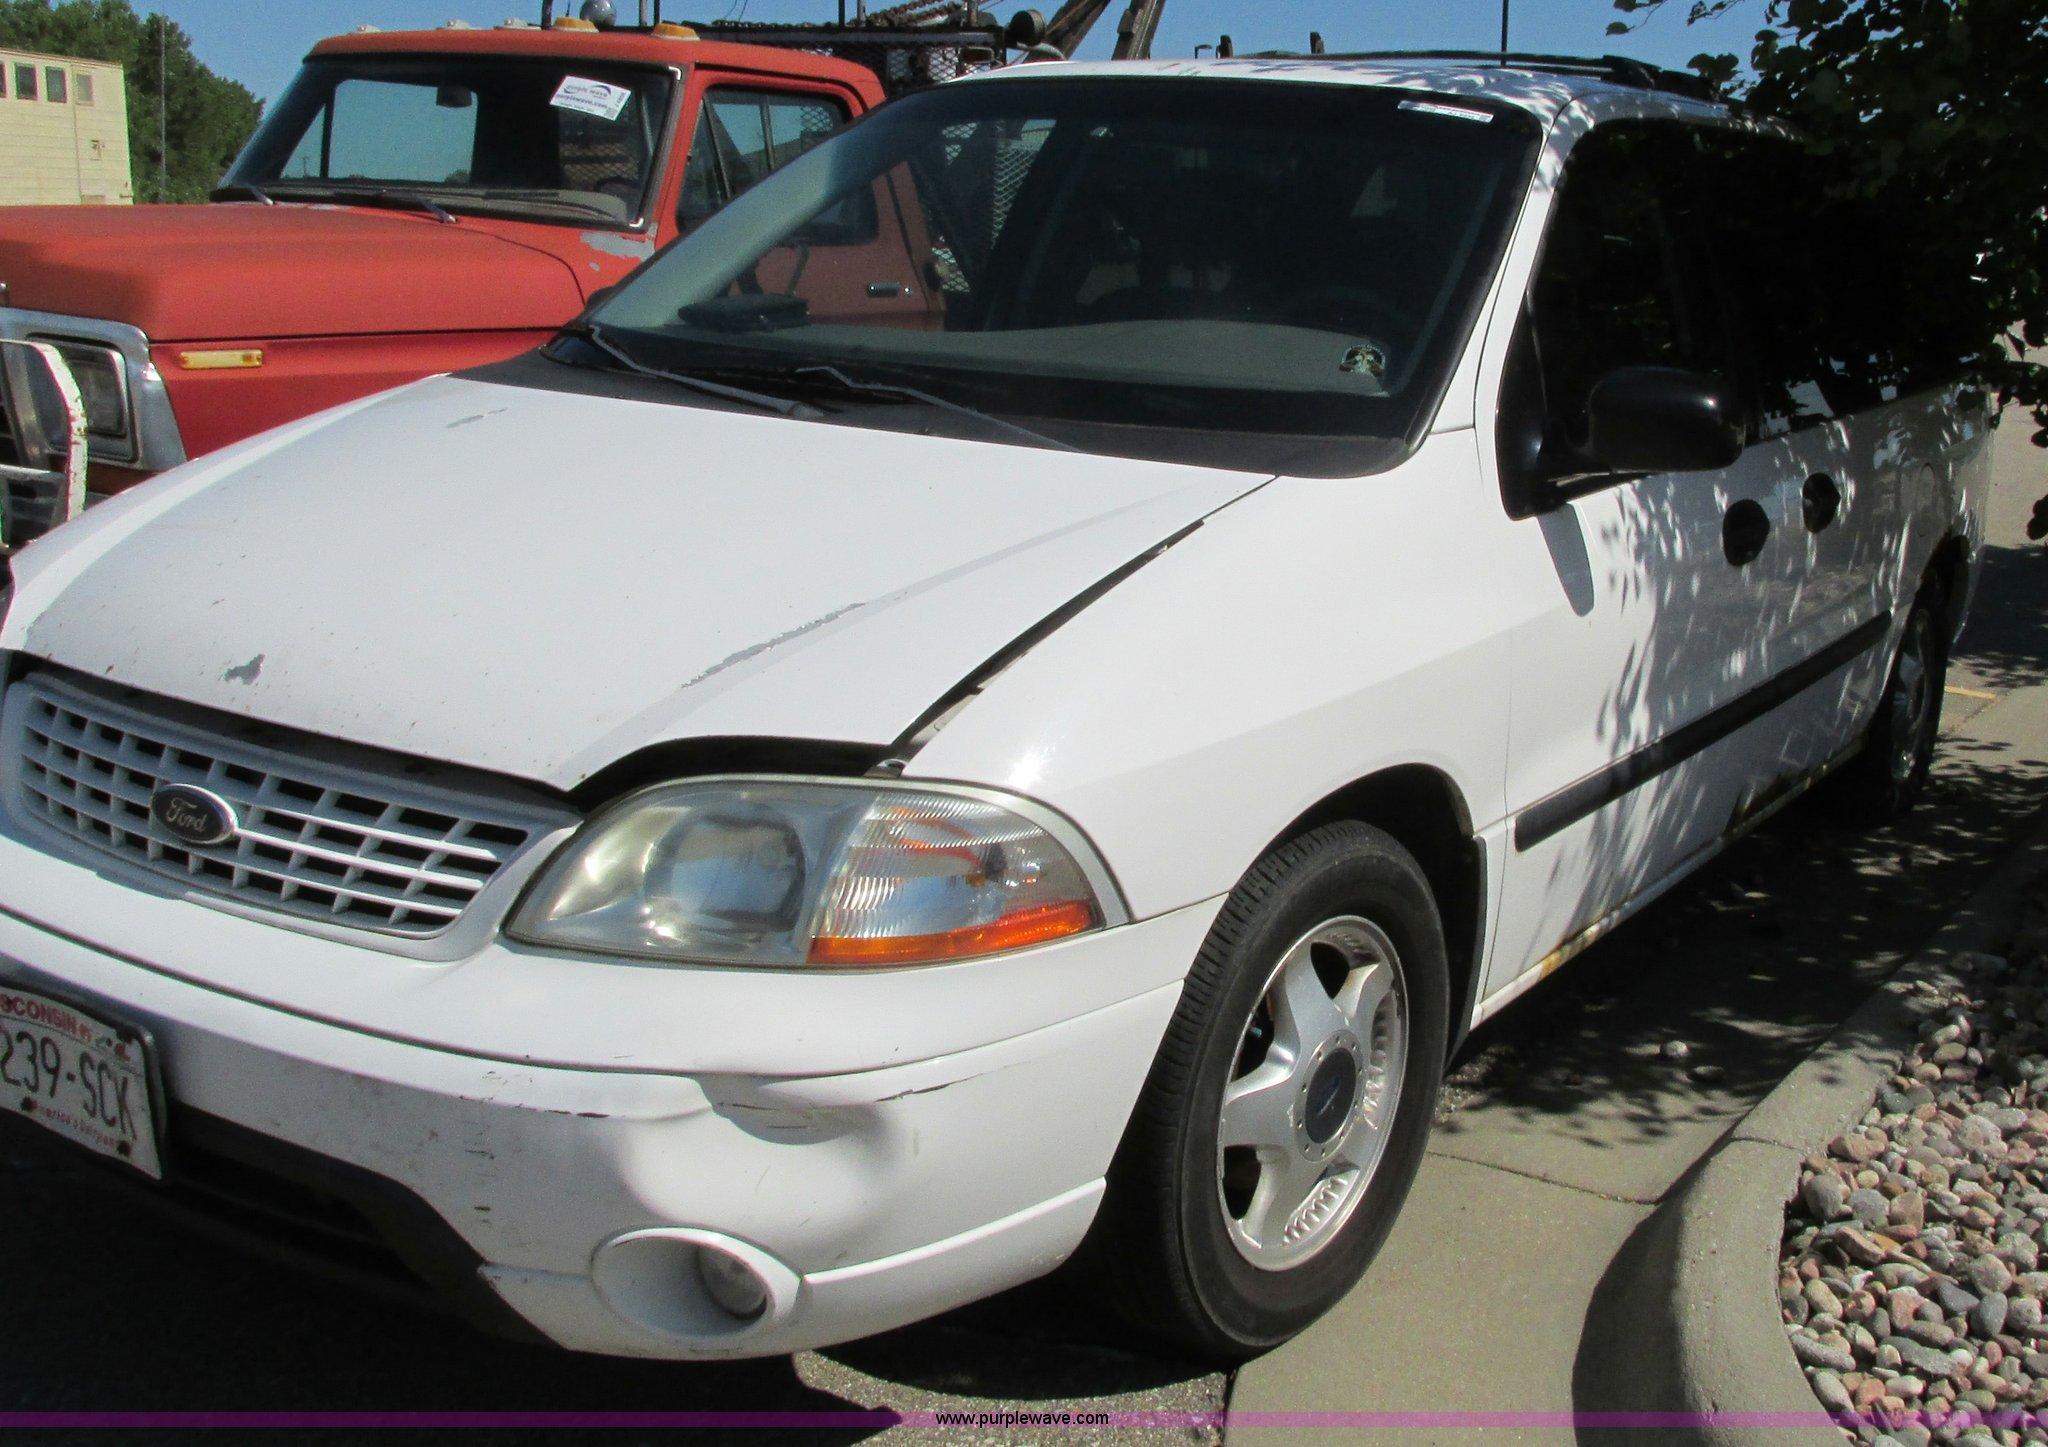 2003 Ford Windstar Lx Van Item Aj9235 Sold September 14 Full Size In New Window